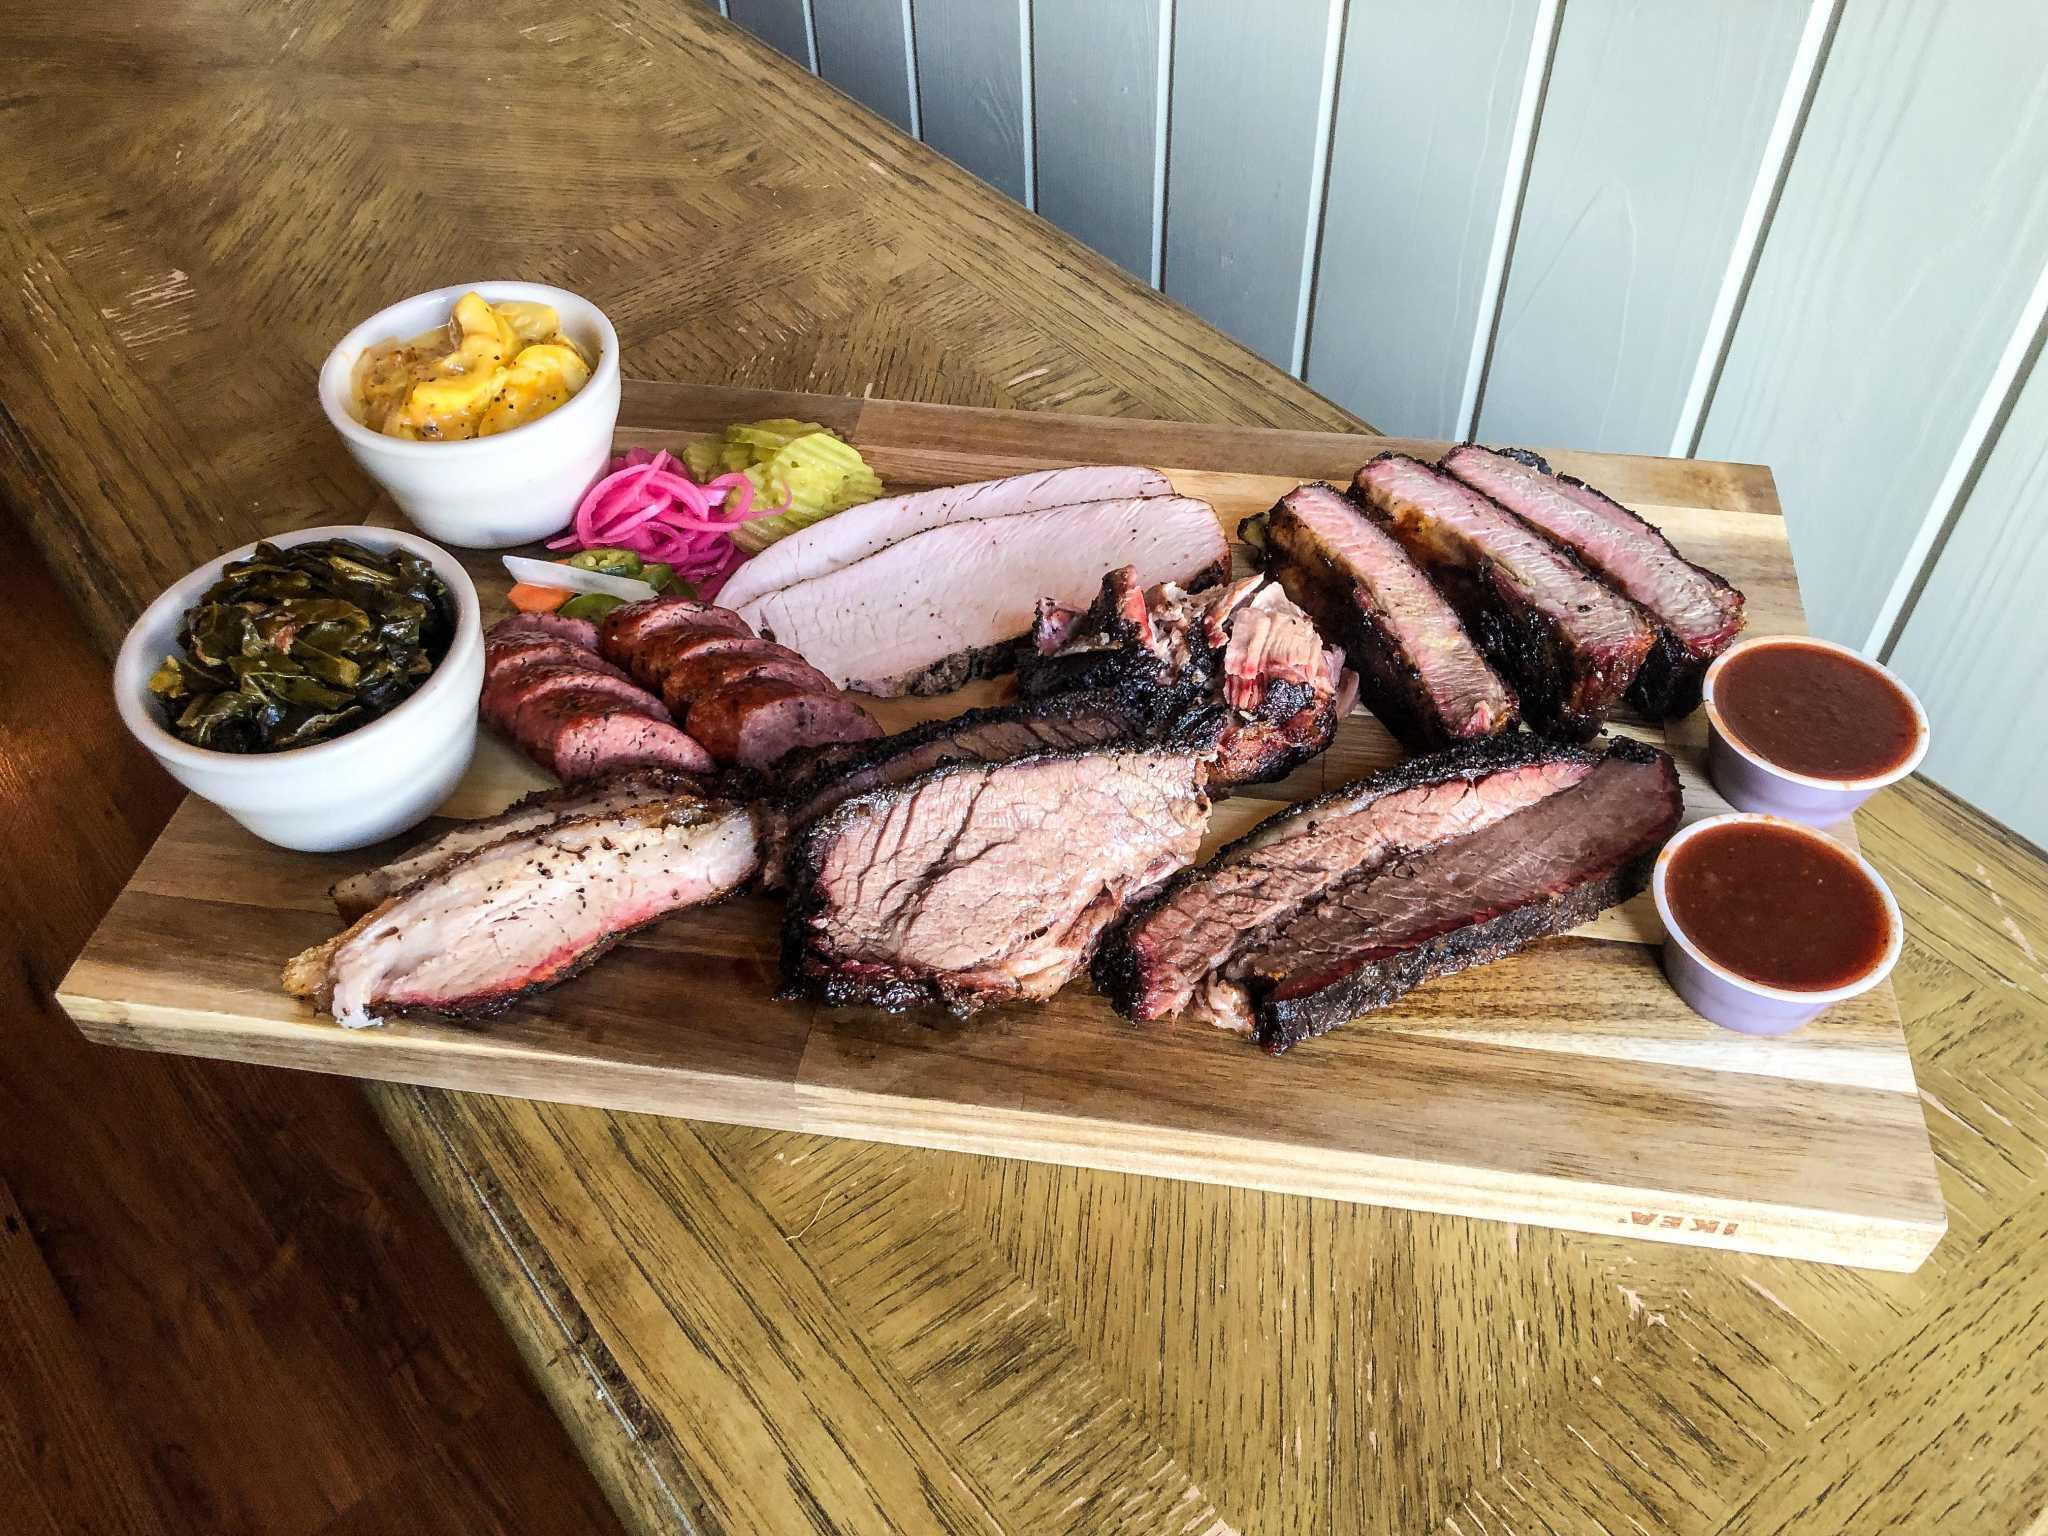 Central Texas-style craft barbecue comes to Galveston